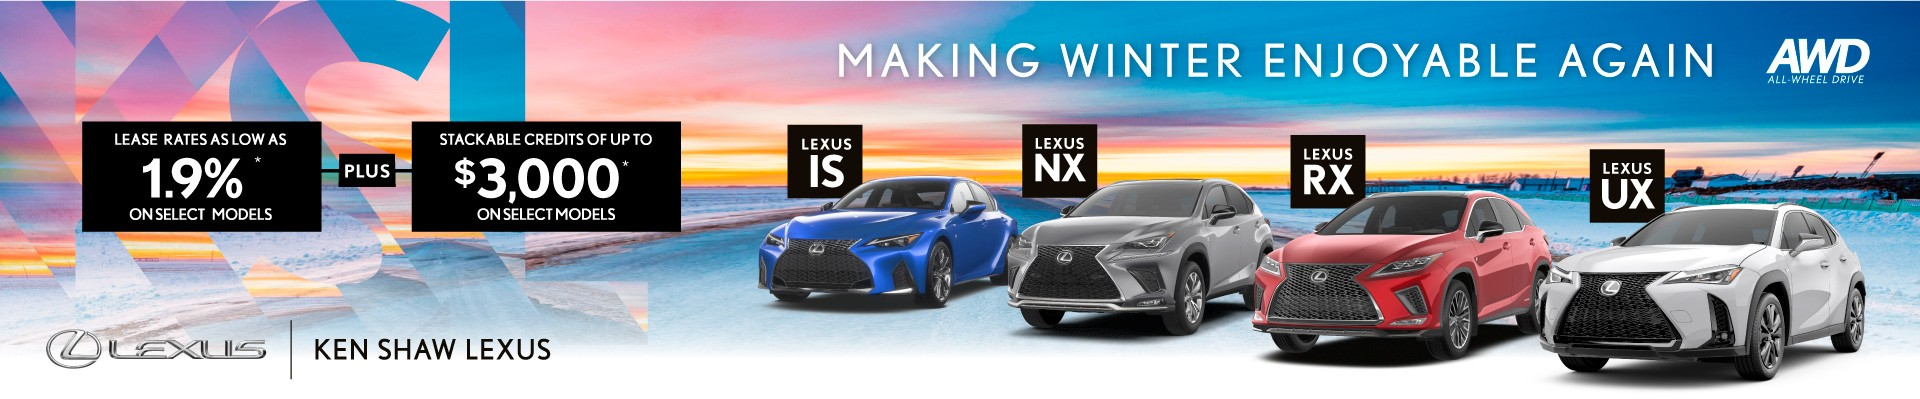 Lexus promotions and offers at Ken Shaw Lexus in Toronto, Ontario Lexus dealership